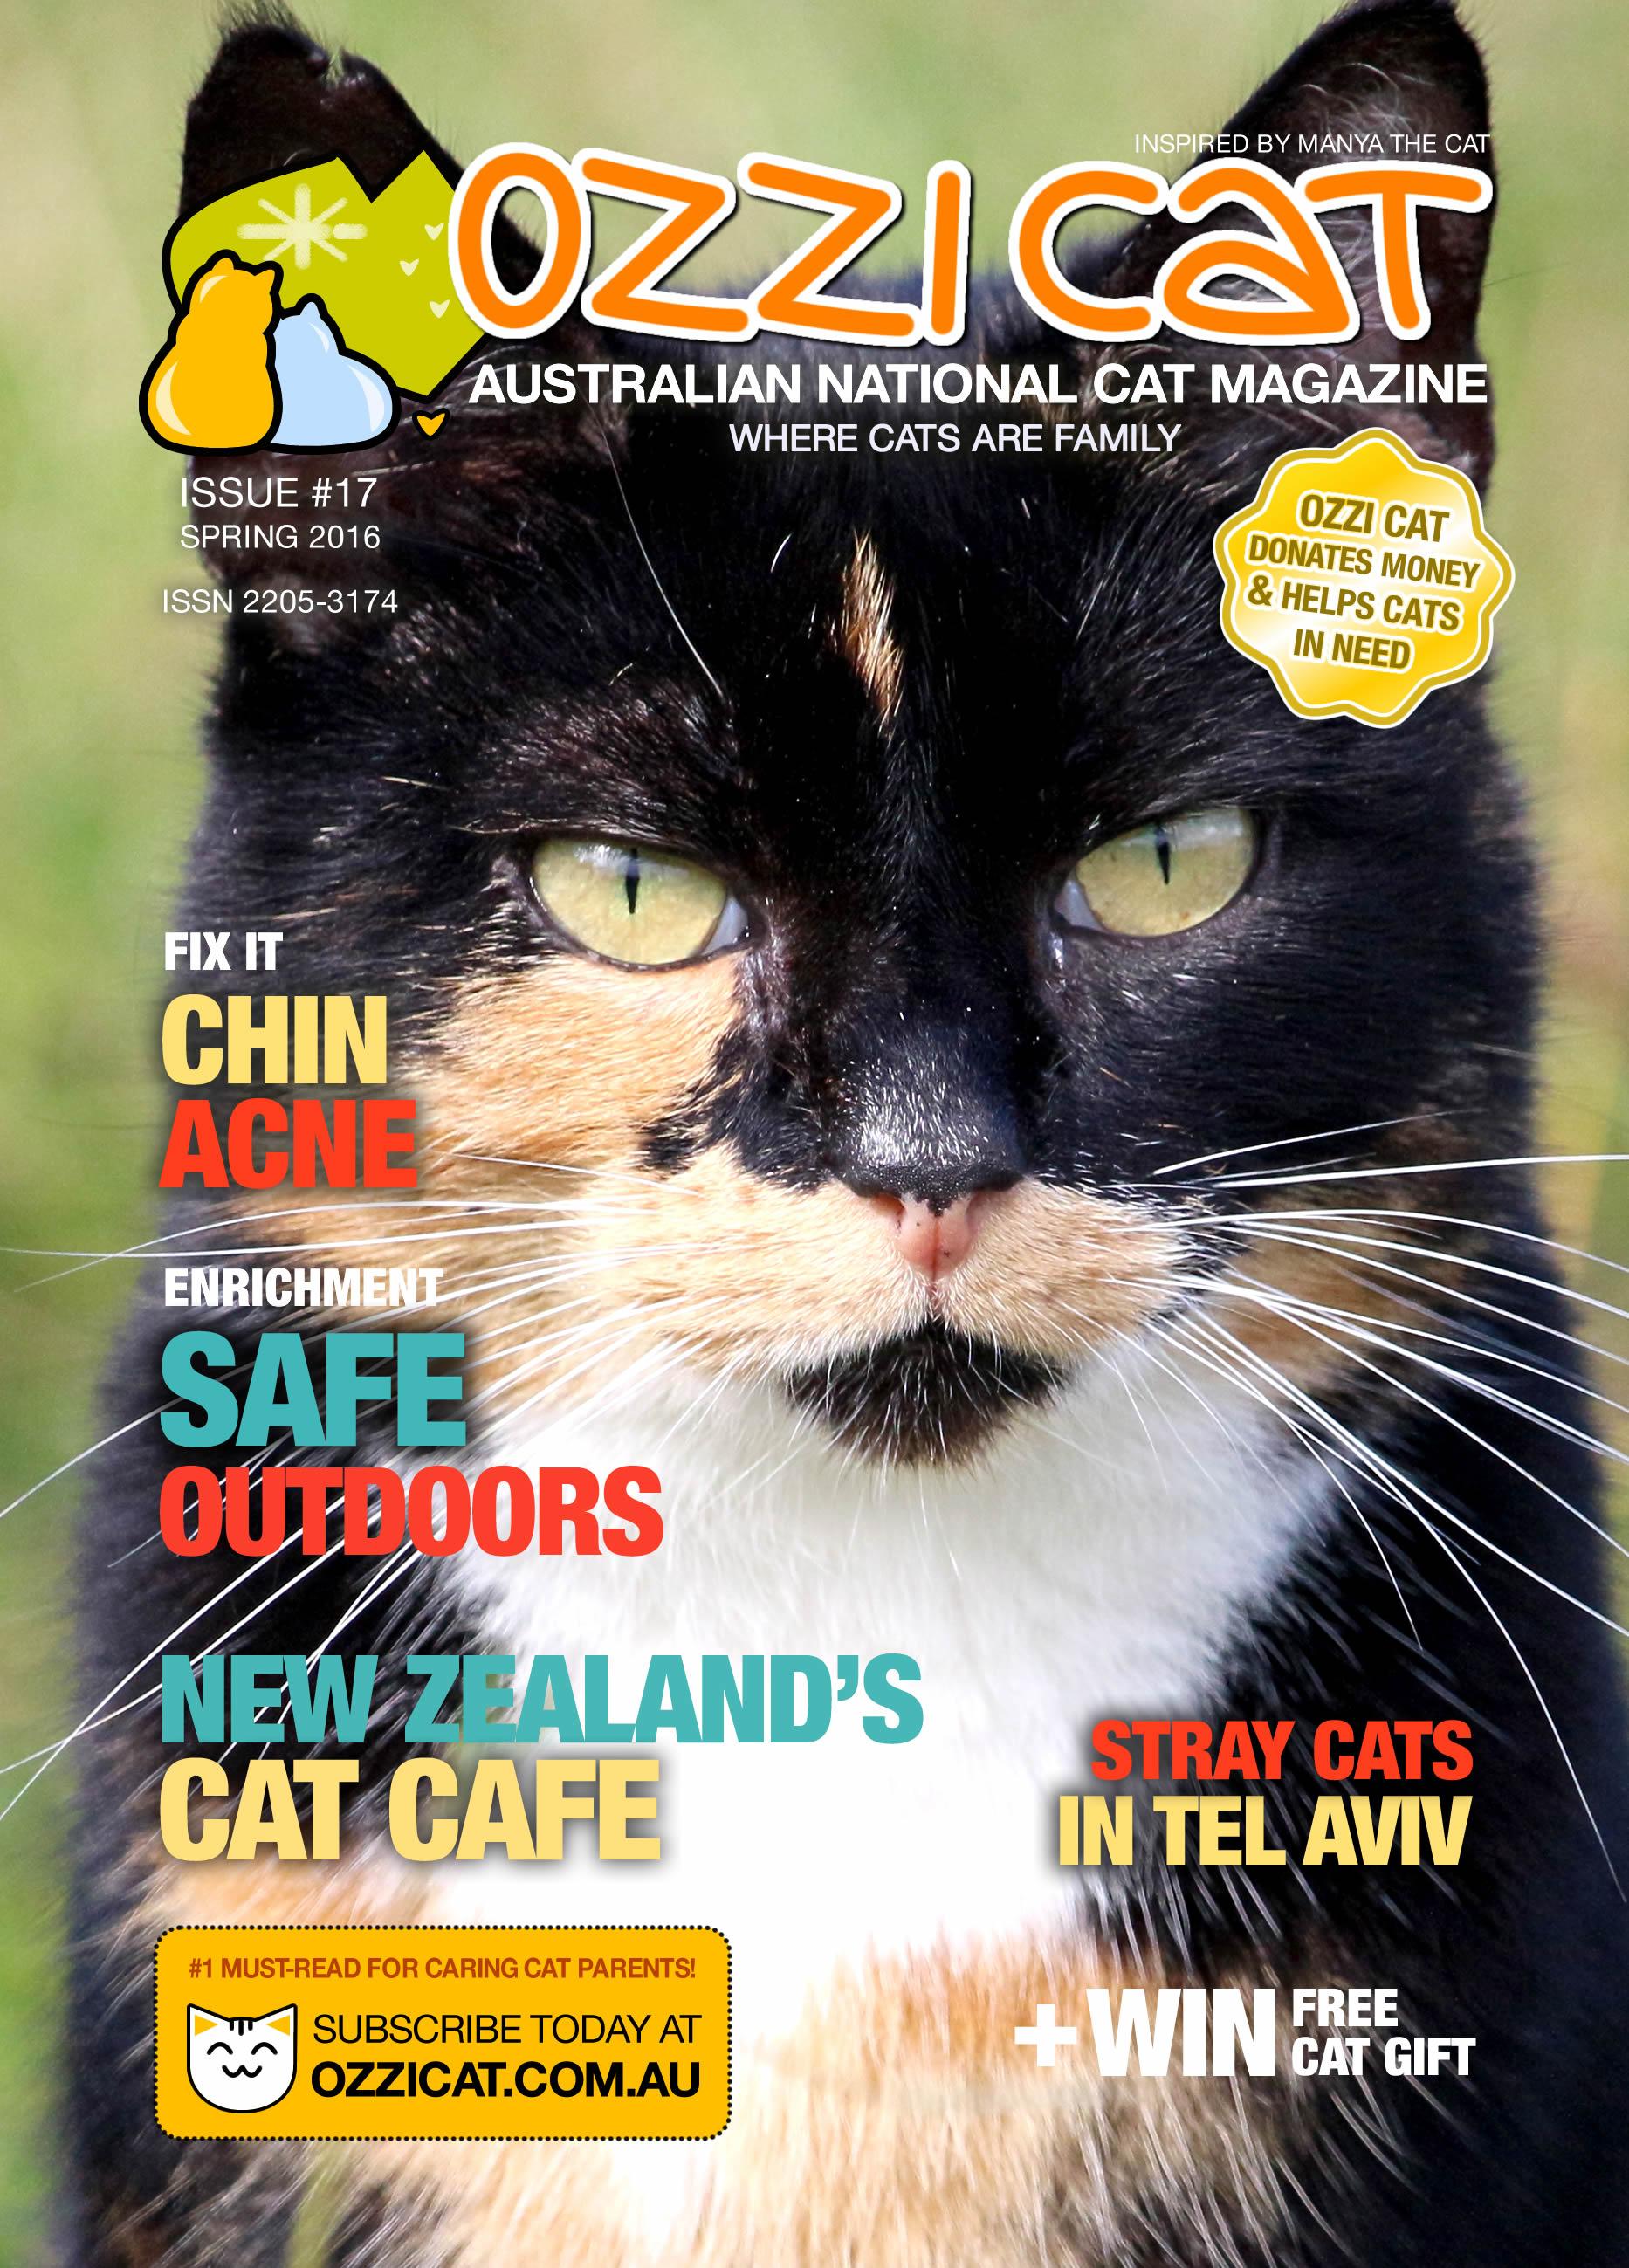 Ozzi Cat Magazine - Issue 17 - Spring 2016